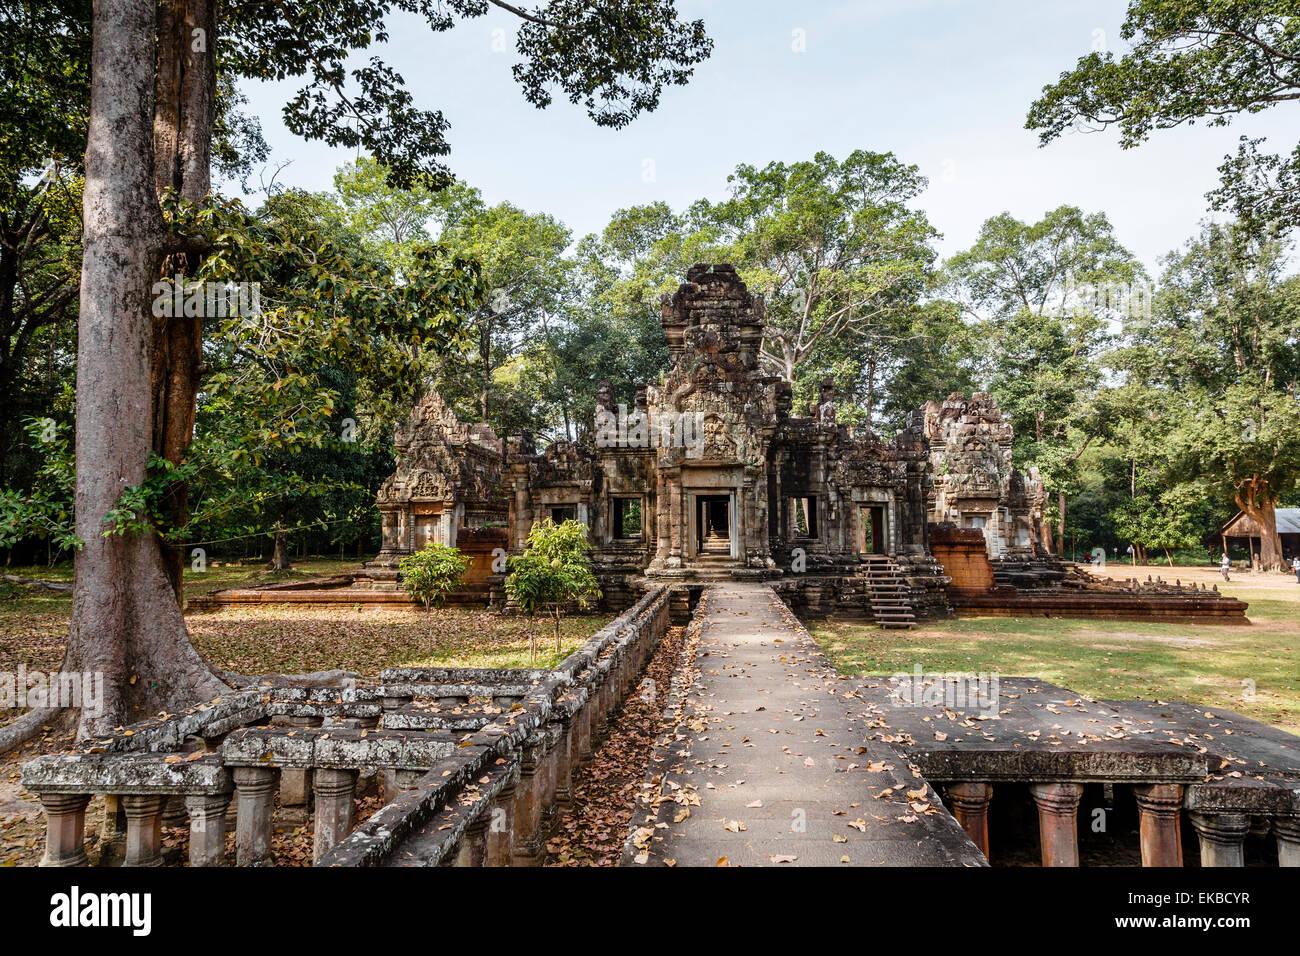 Ruins of the Chau Say Tevoda Temple, Angkor, UNESCO World Heritage Site, Cambodia, Indochina, Southeast Asia, Asia - Stock Image